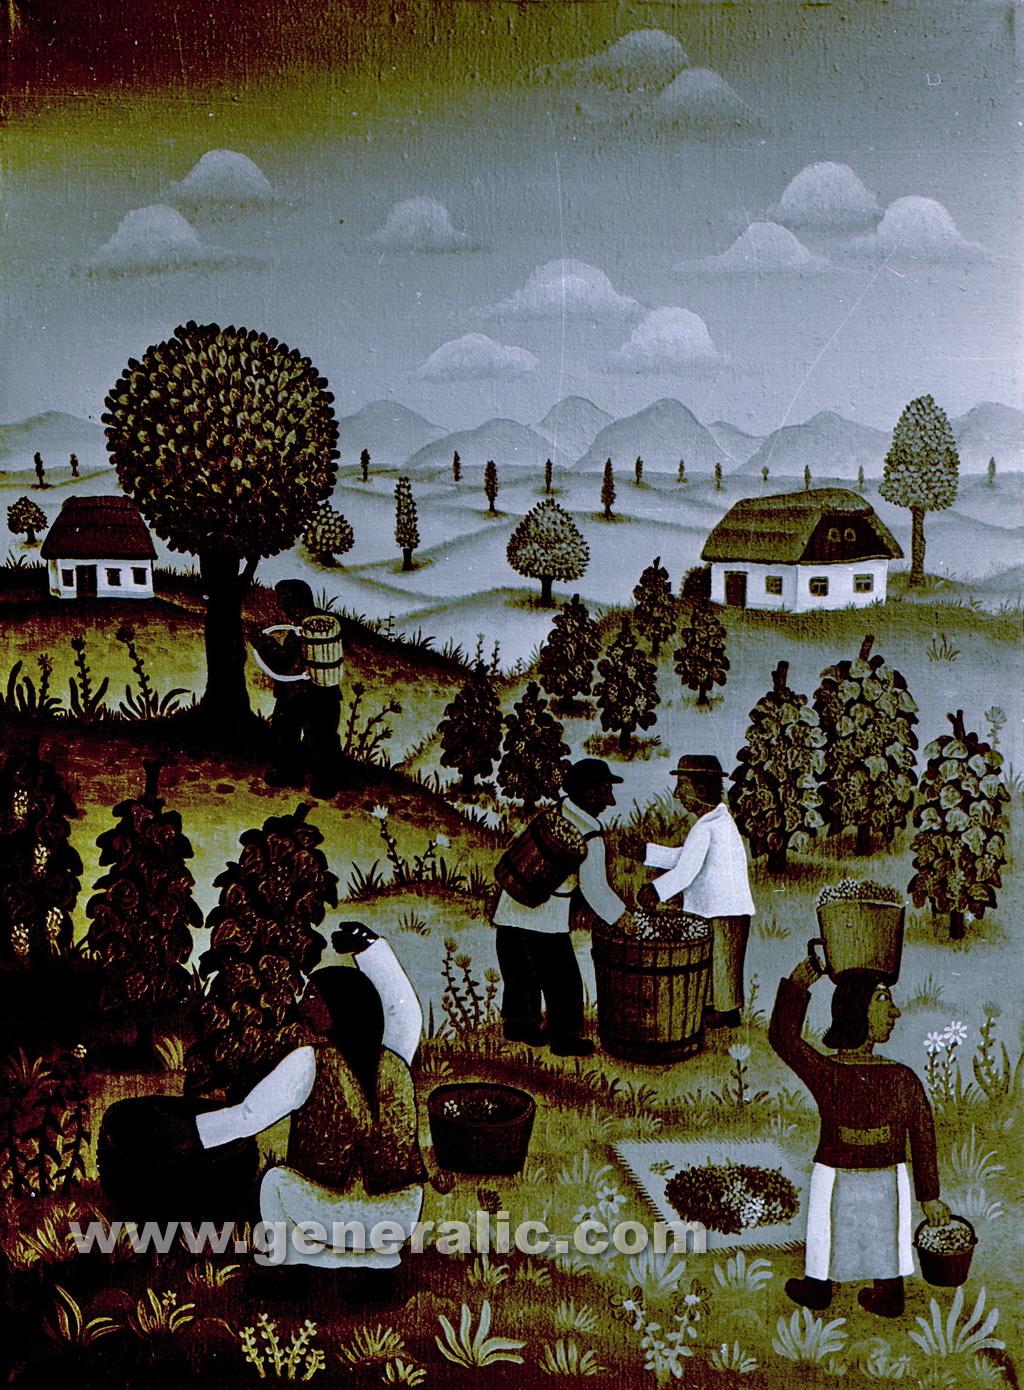 Josip Generalic, 1968, Vintage, oil on canvas